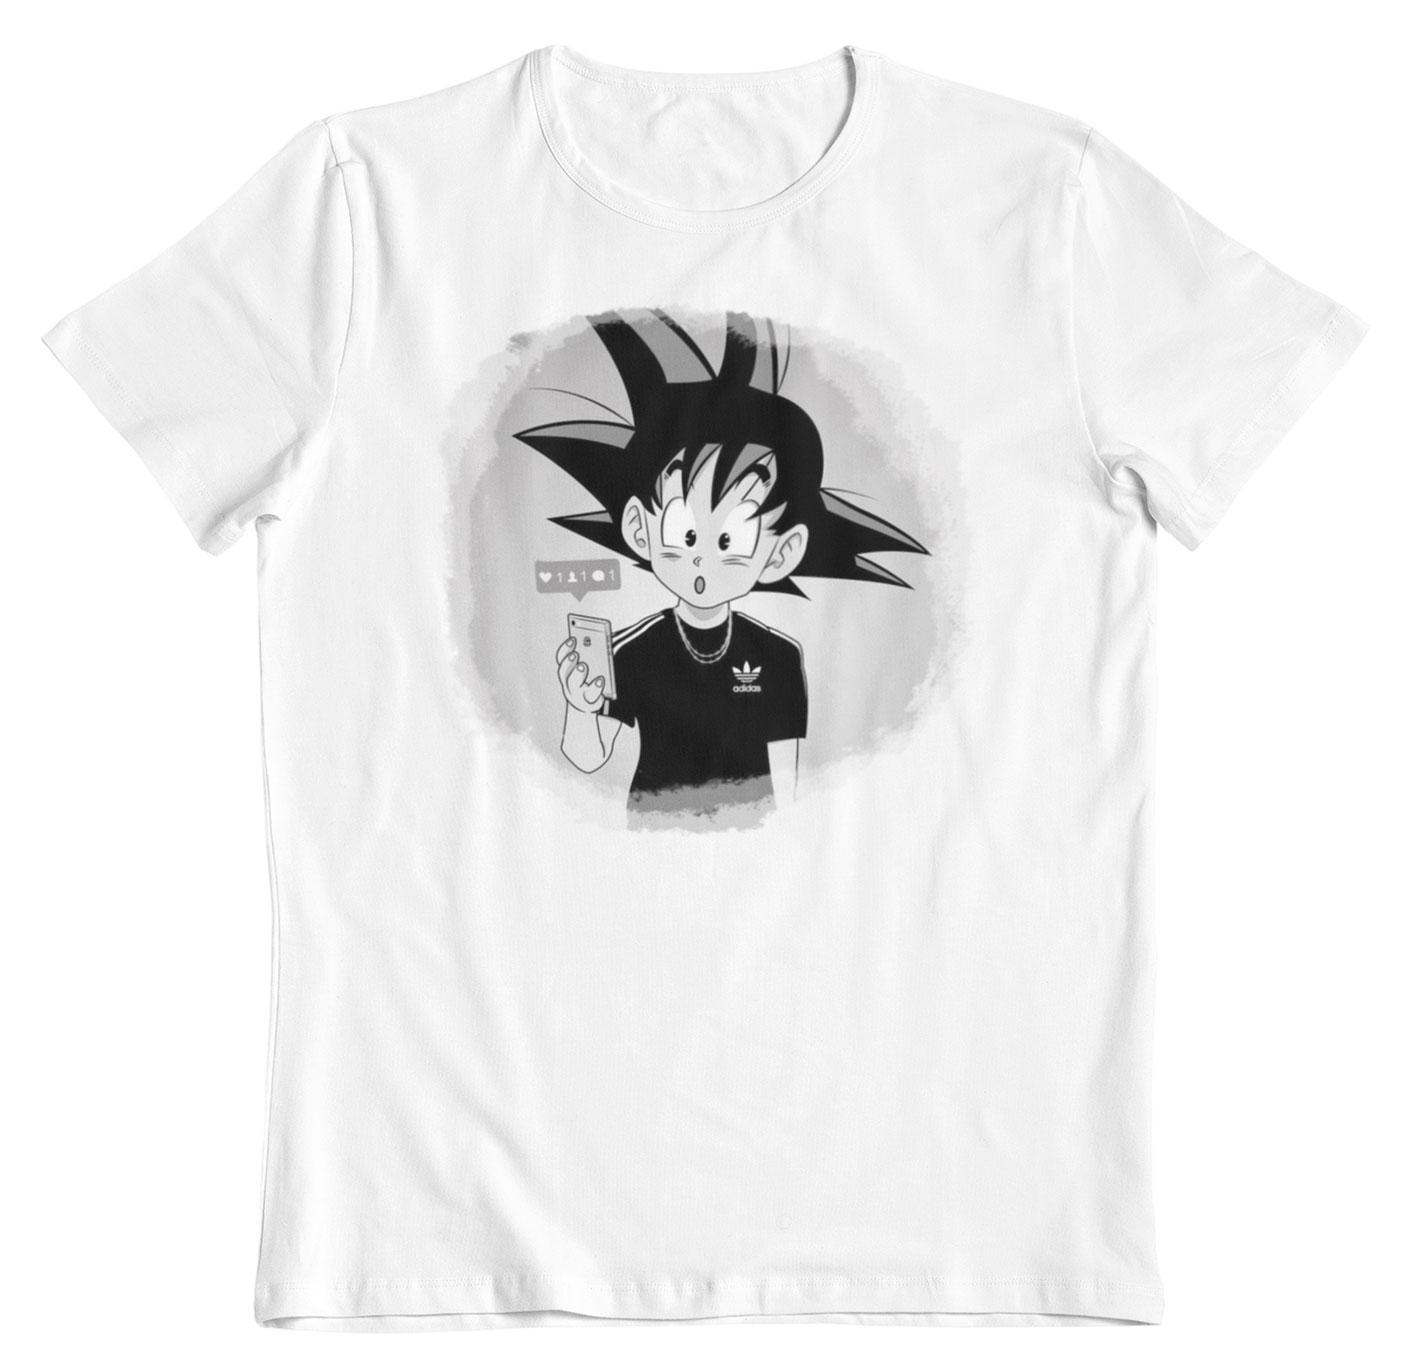 Camiseta Goku instagrammer